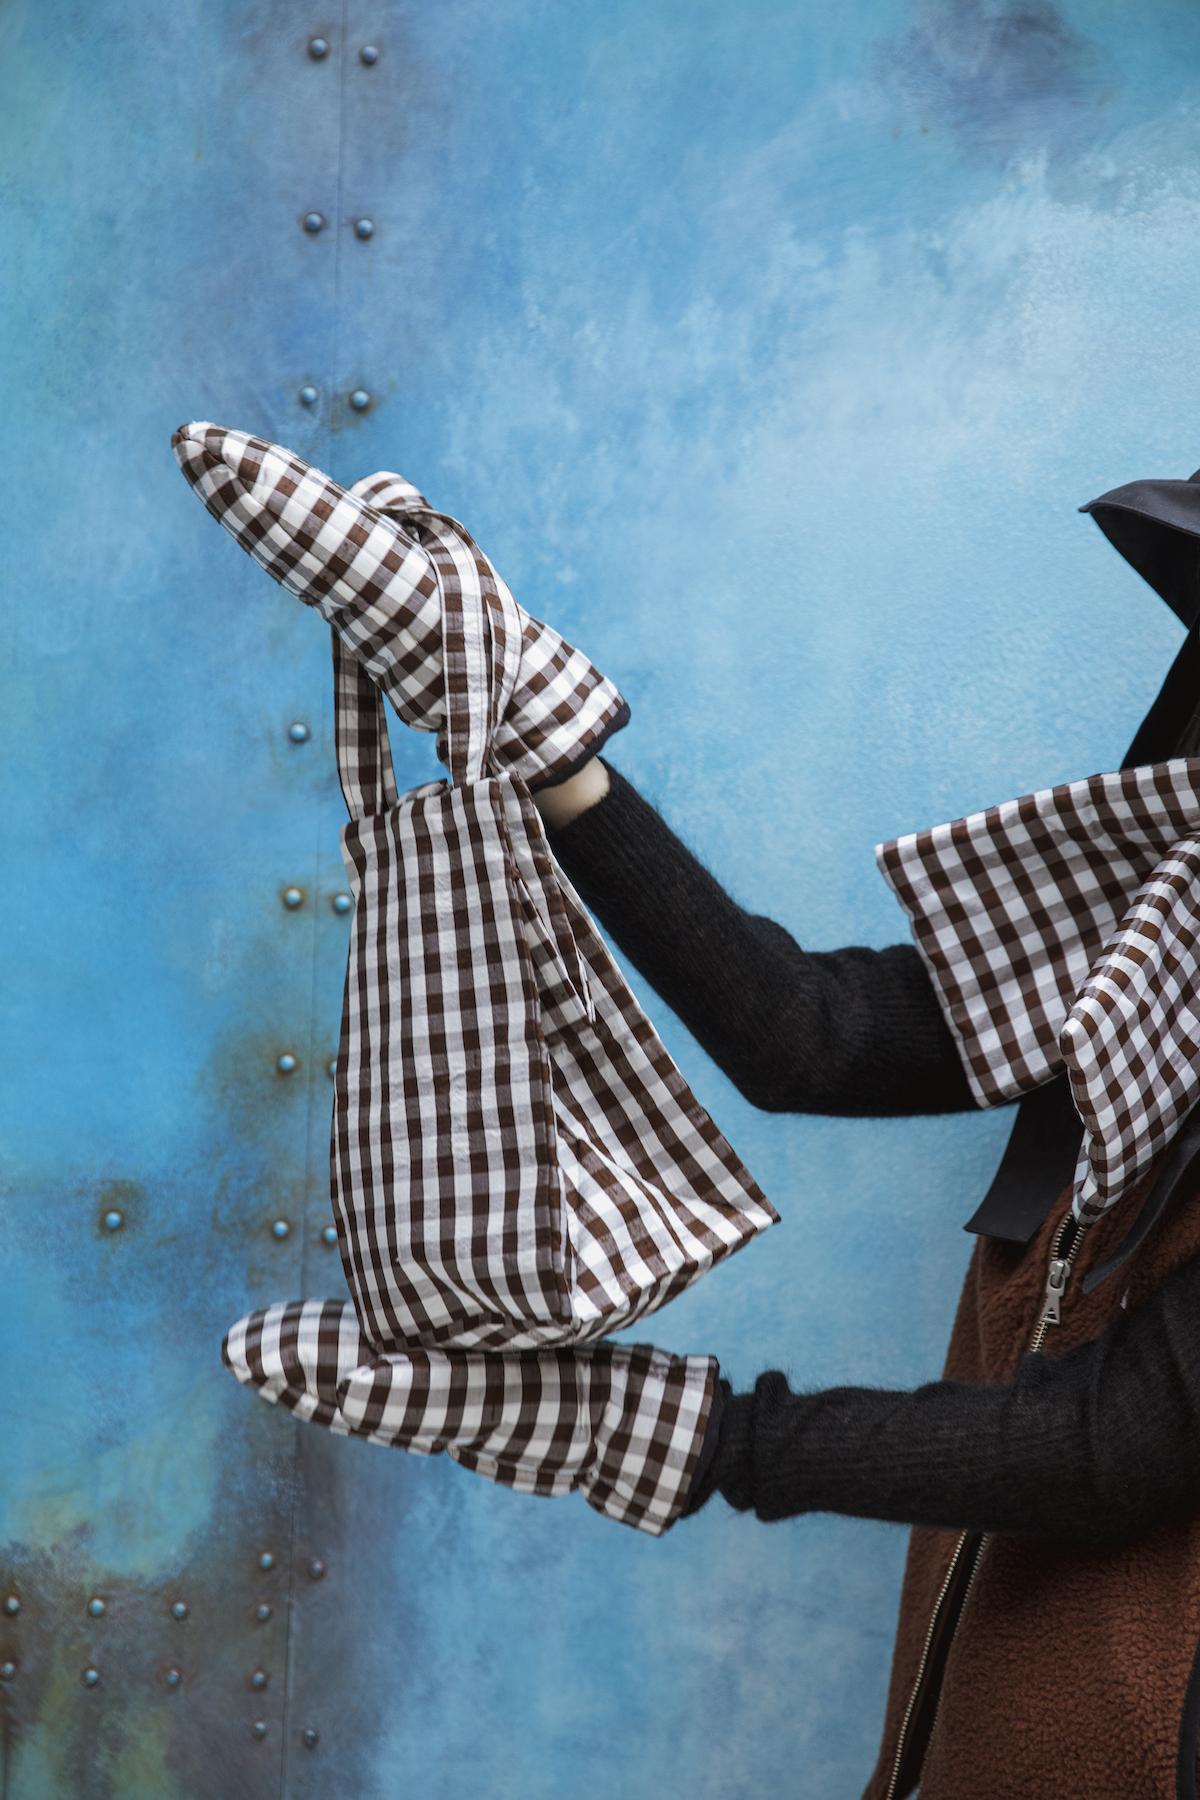 40_3 jacket¥24,000 knit¥21,000 hat¥23,000 scarf¥21,000 mitten¥21,000 bag¥31,000